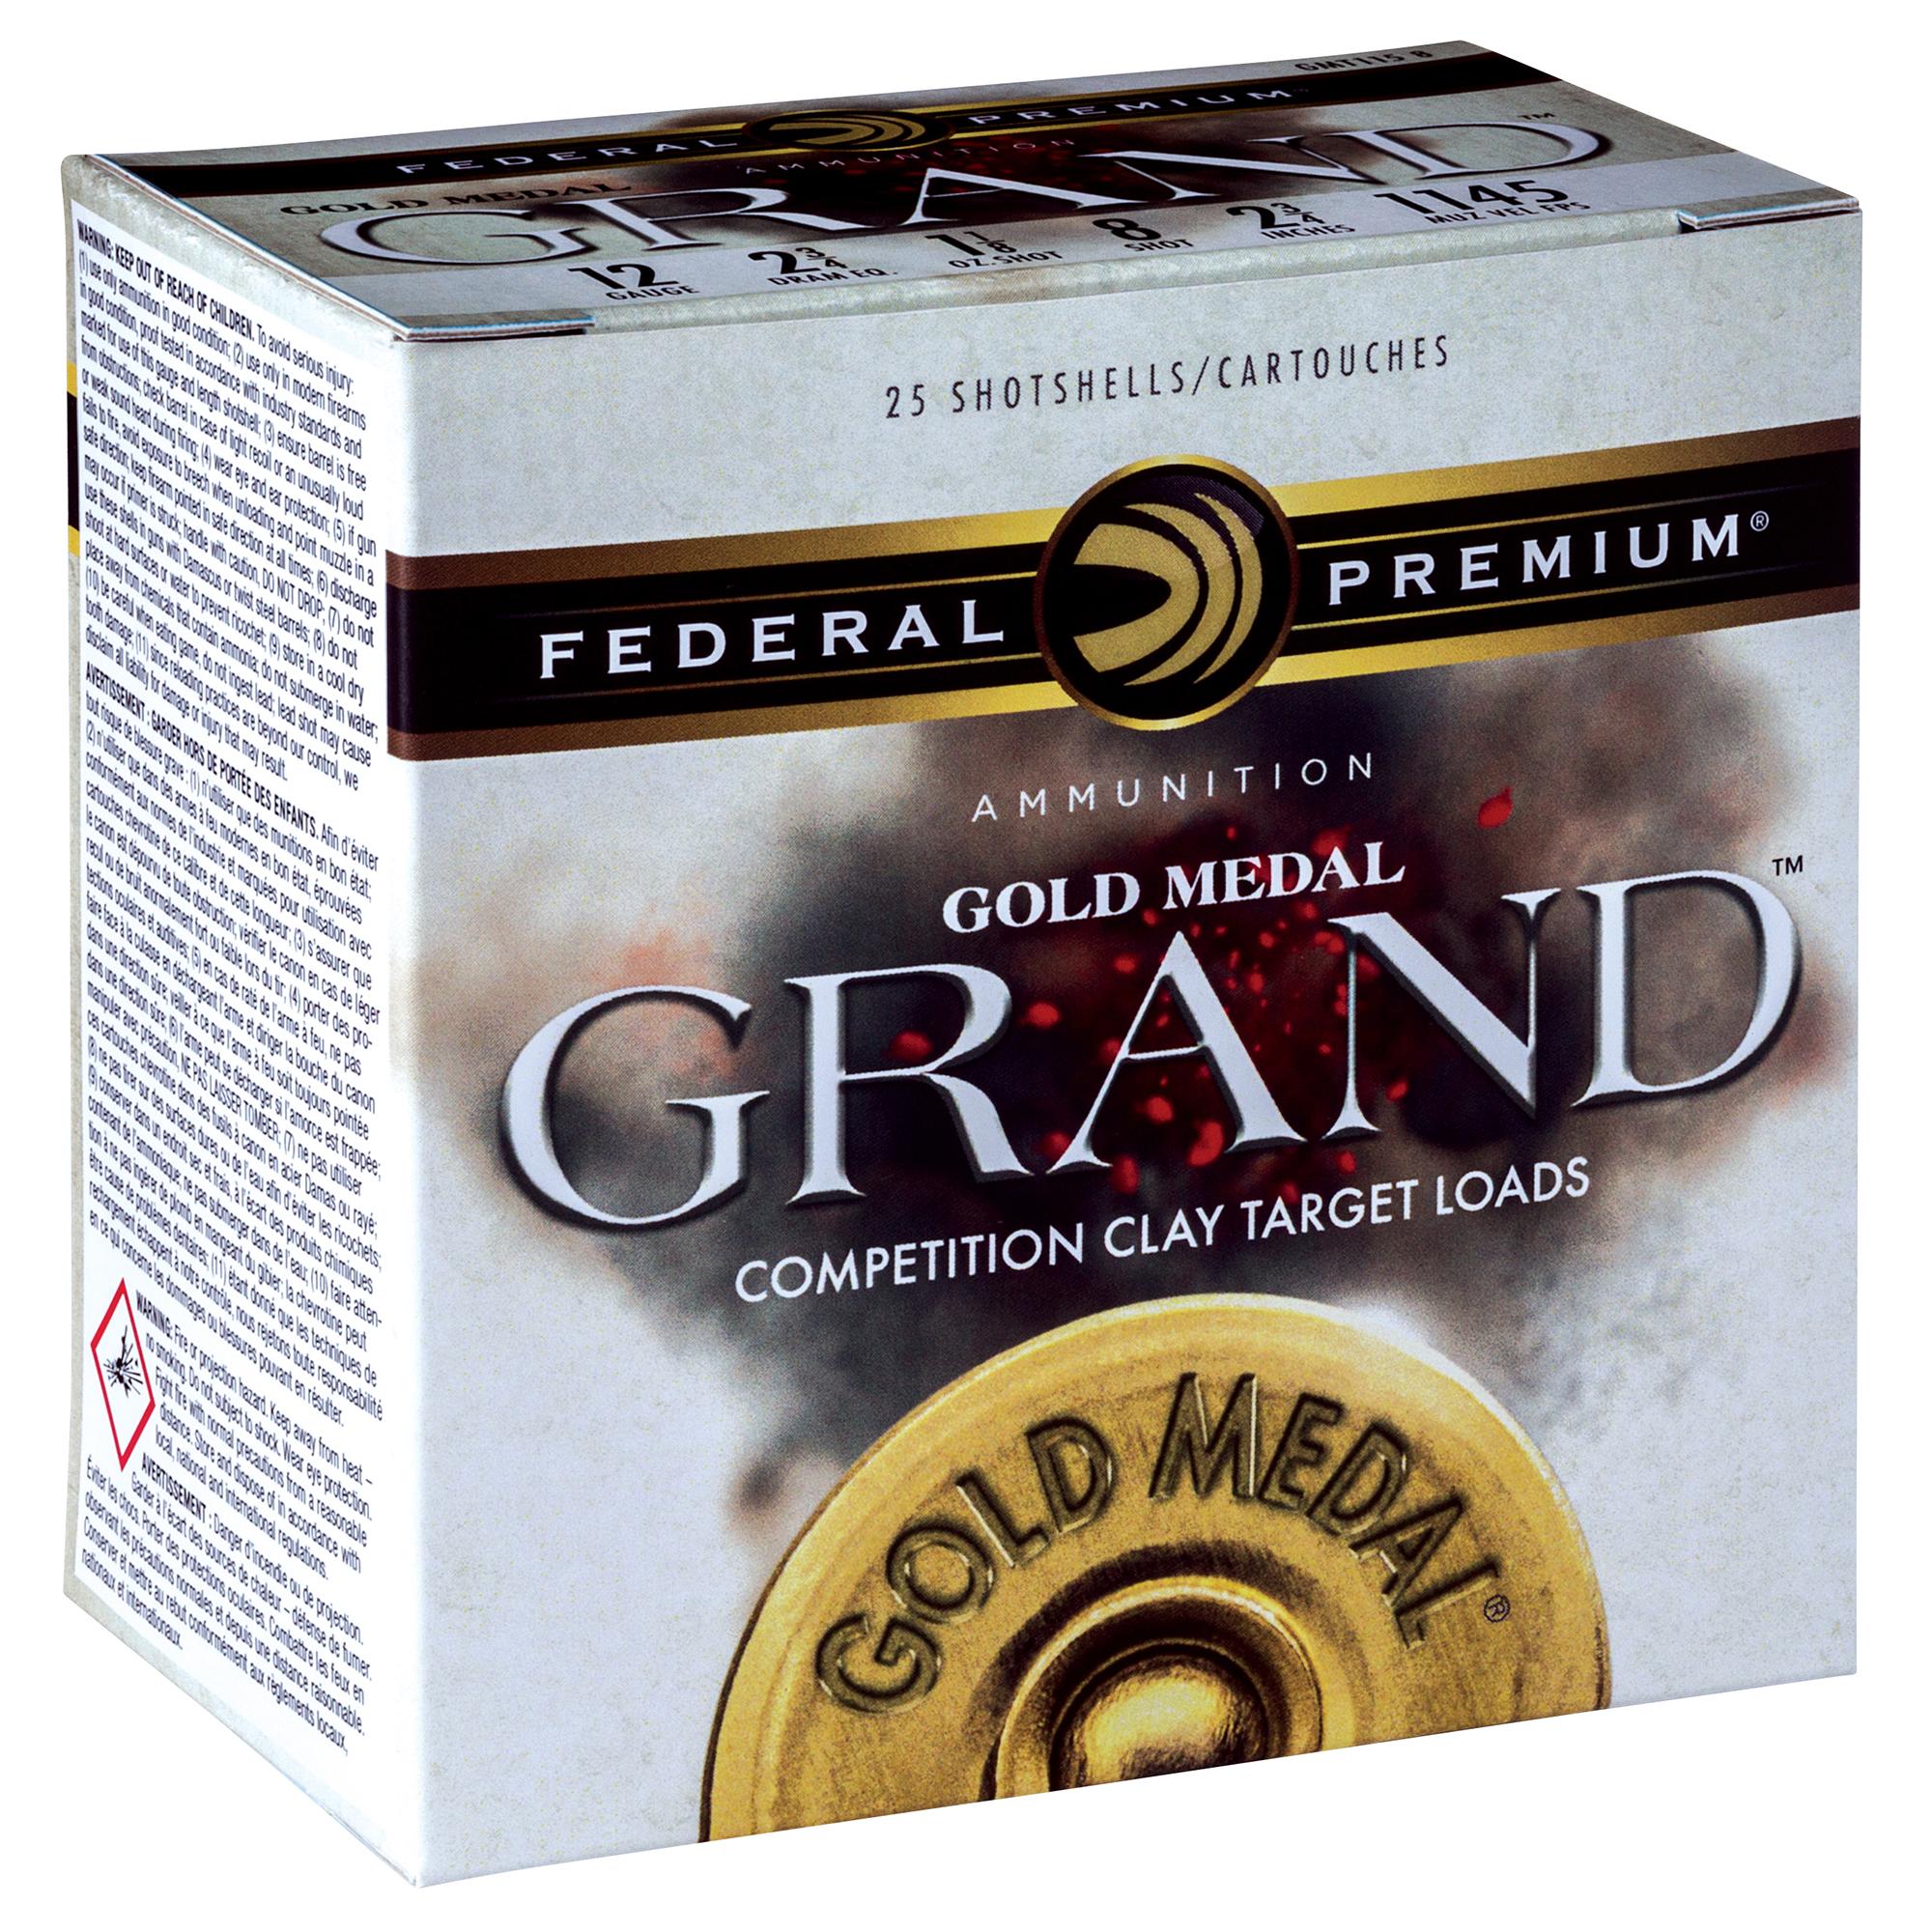 Federal Premium Gold Medal Grand Shotgun Ammo, 12-ga, 2-3/4″, 1-1/8 oz, 7.5